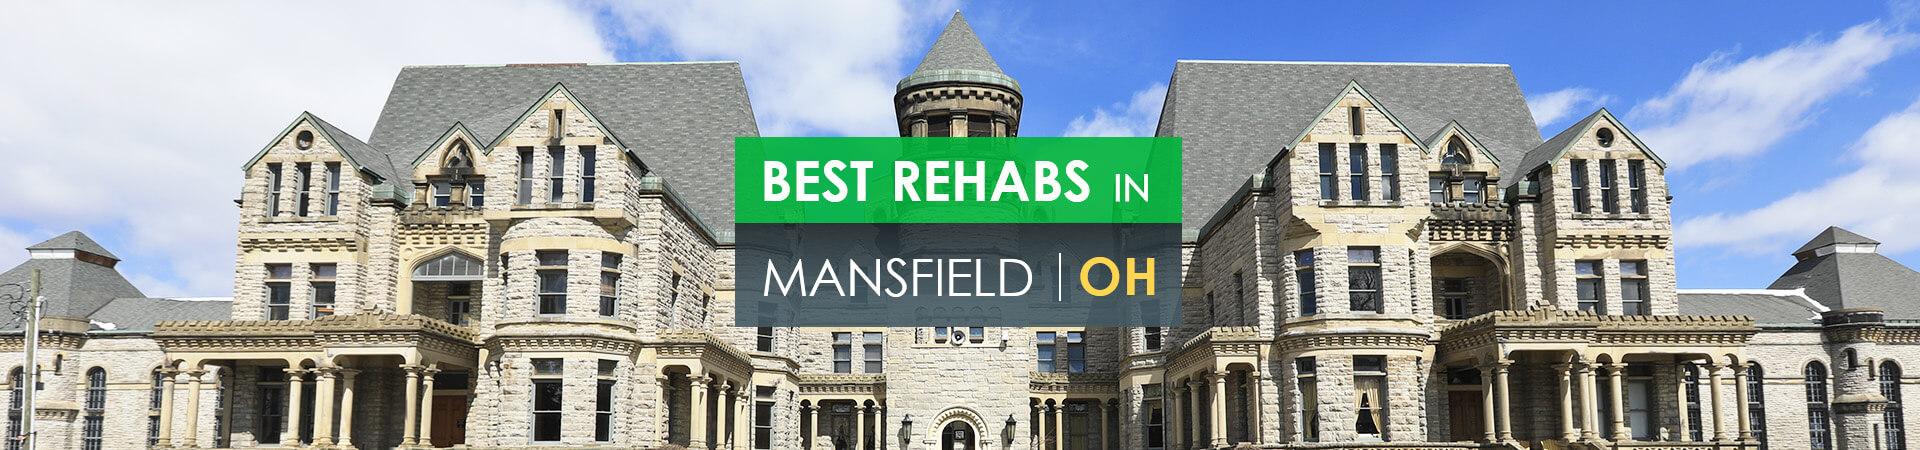 Best rehabs in Mansfield, OH